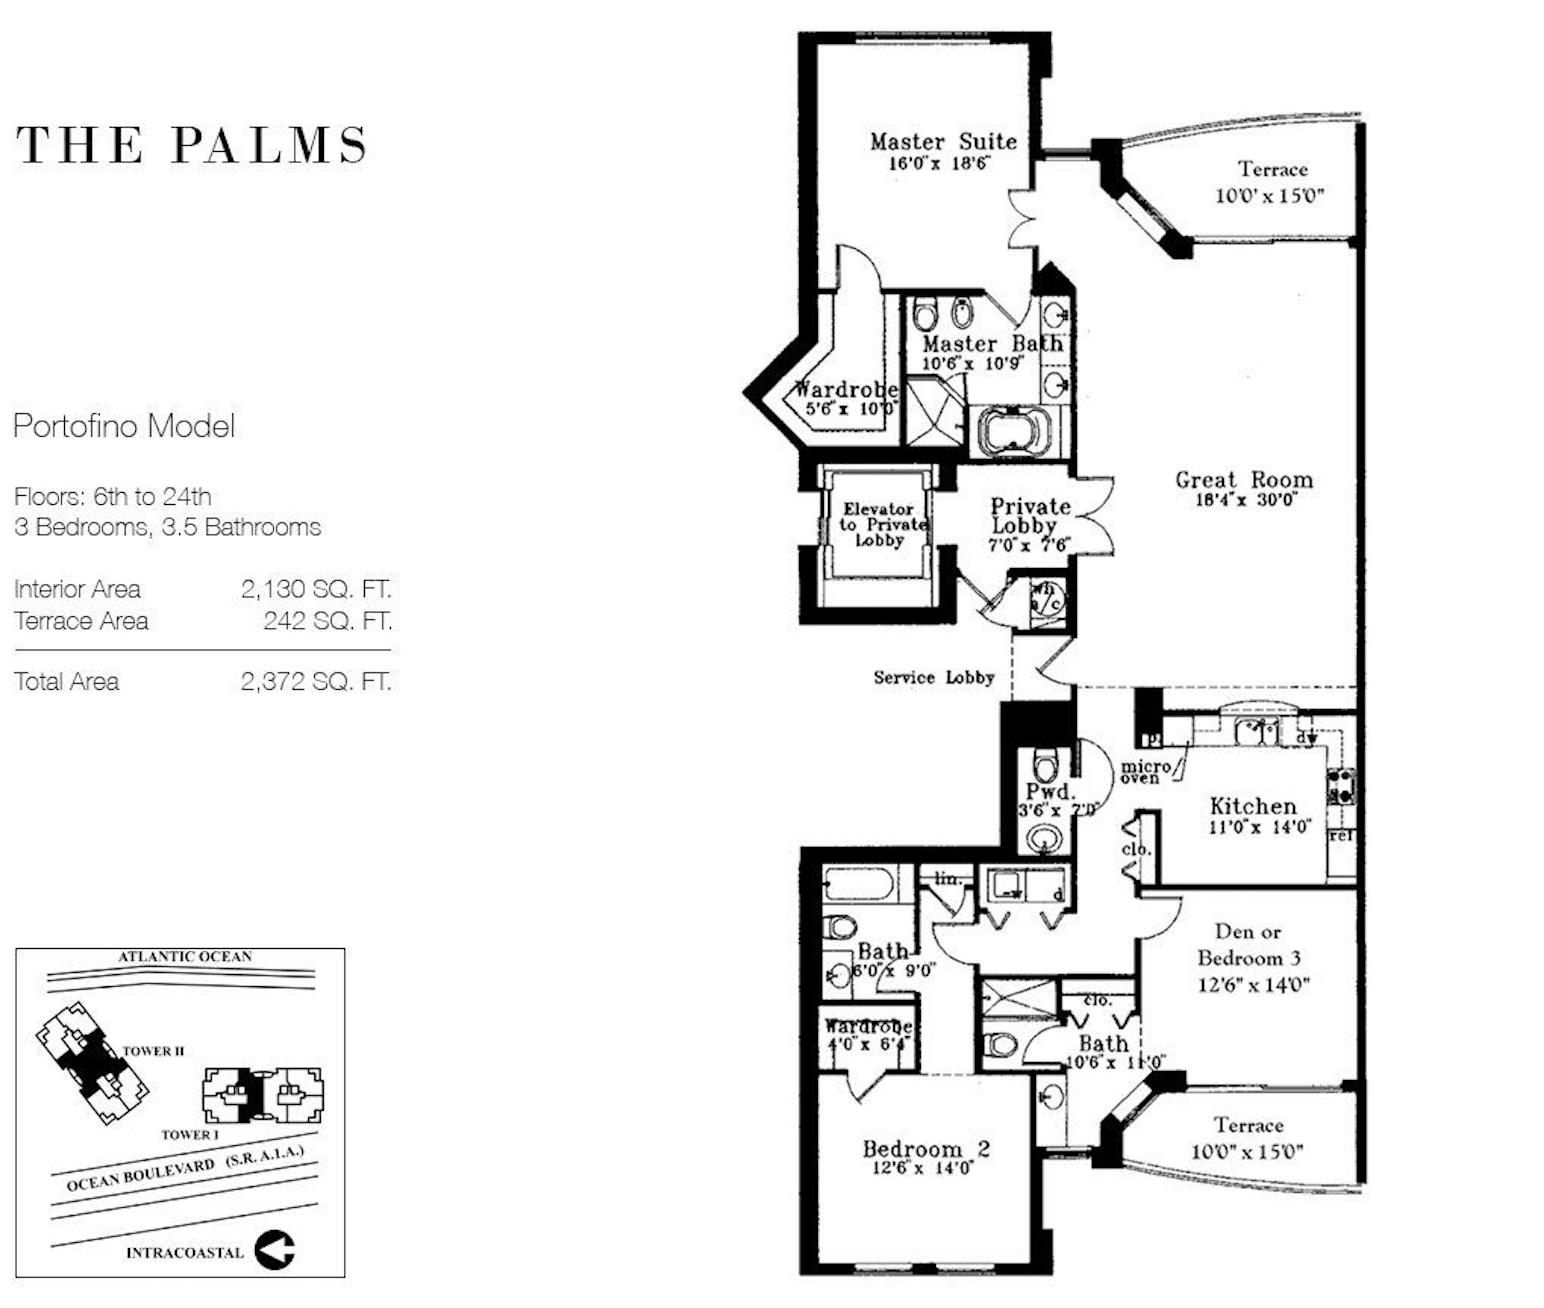 The Palms Fort Lauderdale | Floor Plan Portofino